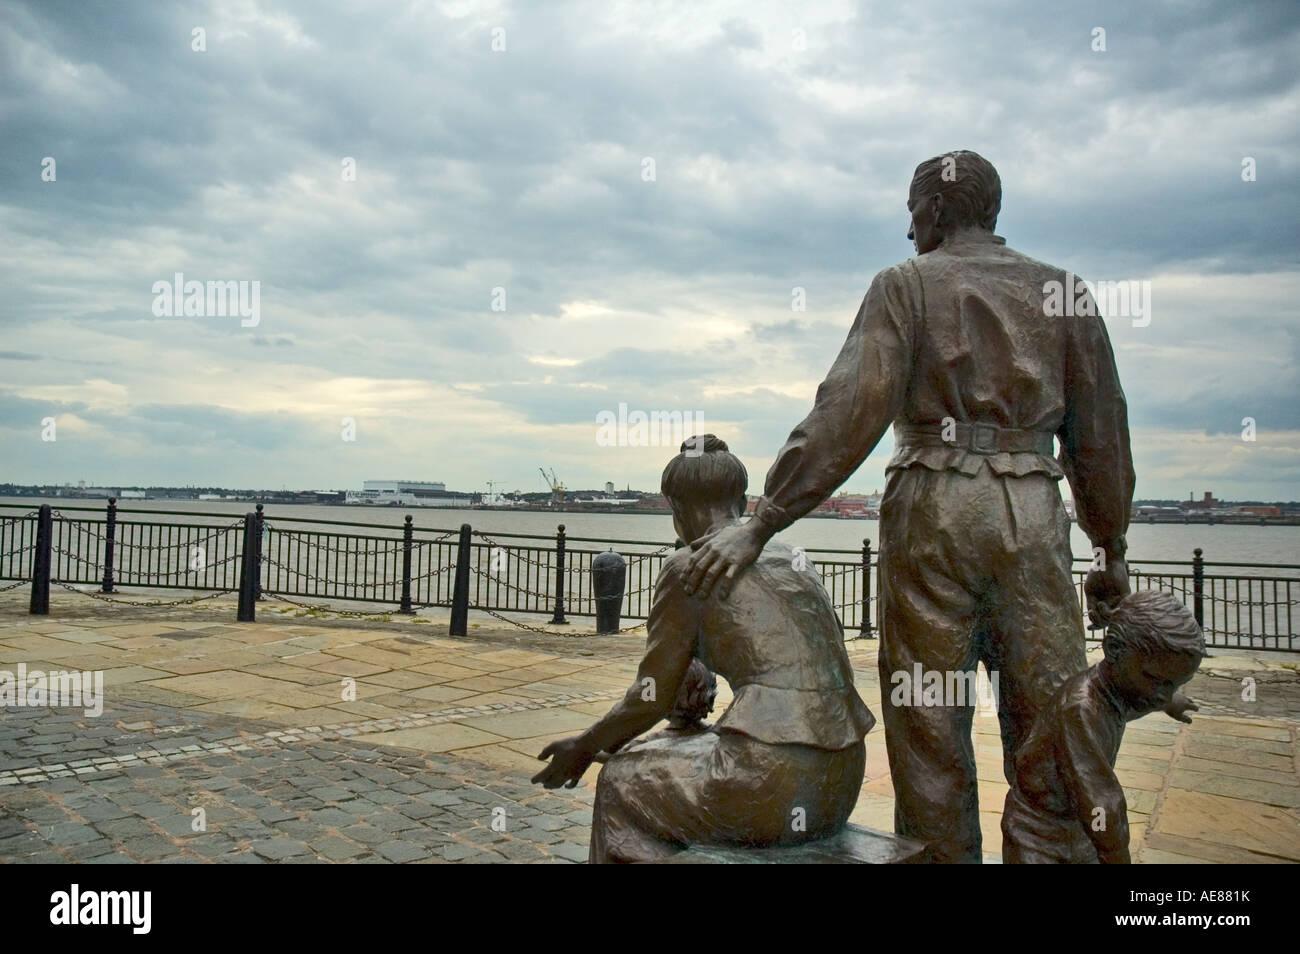 Emigrants, a statue near the pier head. Liverpool, Merseyside, England, UK - Stock Image